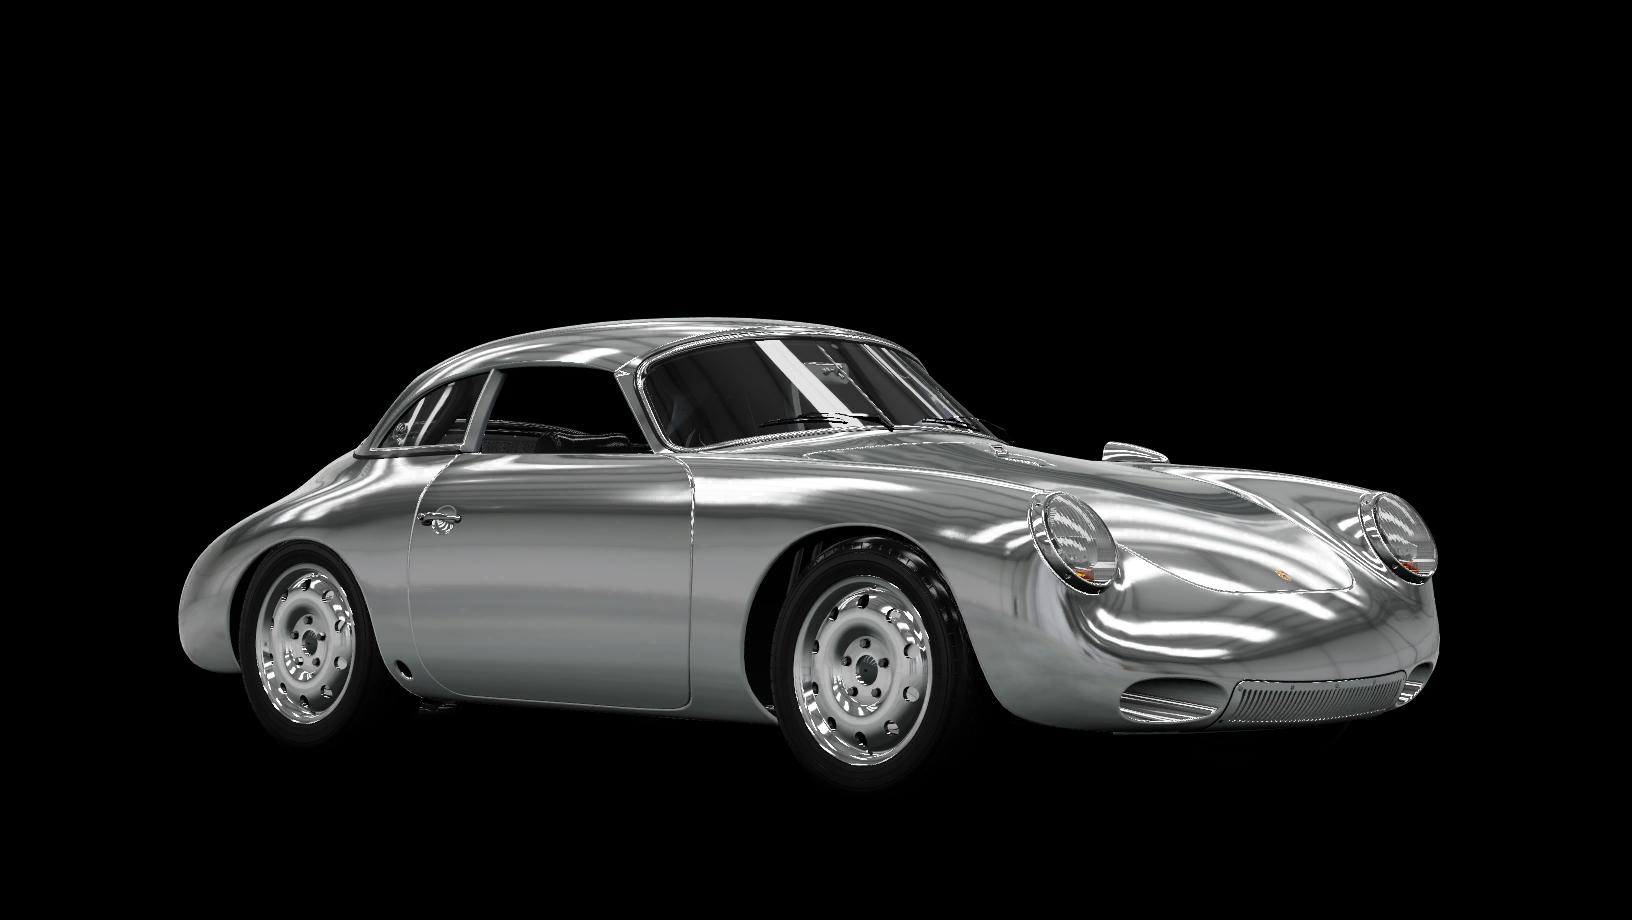 Forza-Horizon-4-Porsche-356-C-Cabriolet-Emory-Special